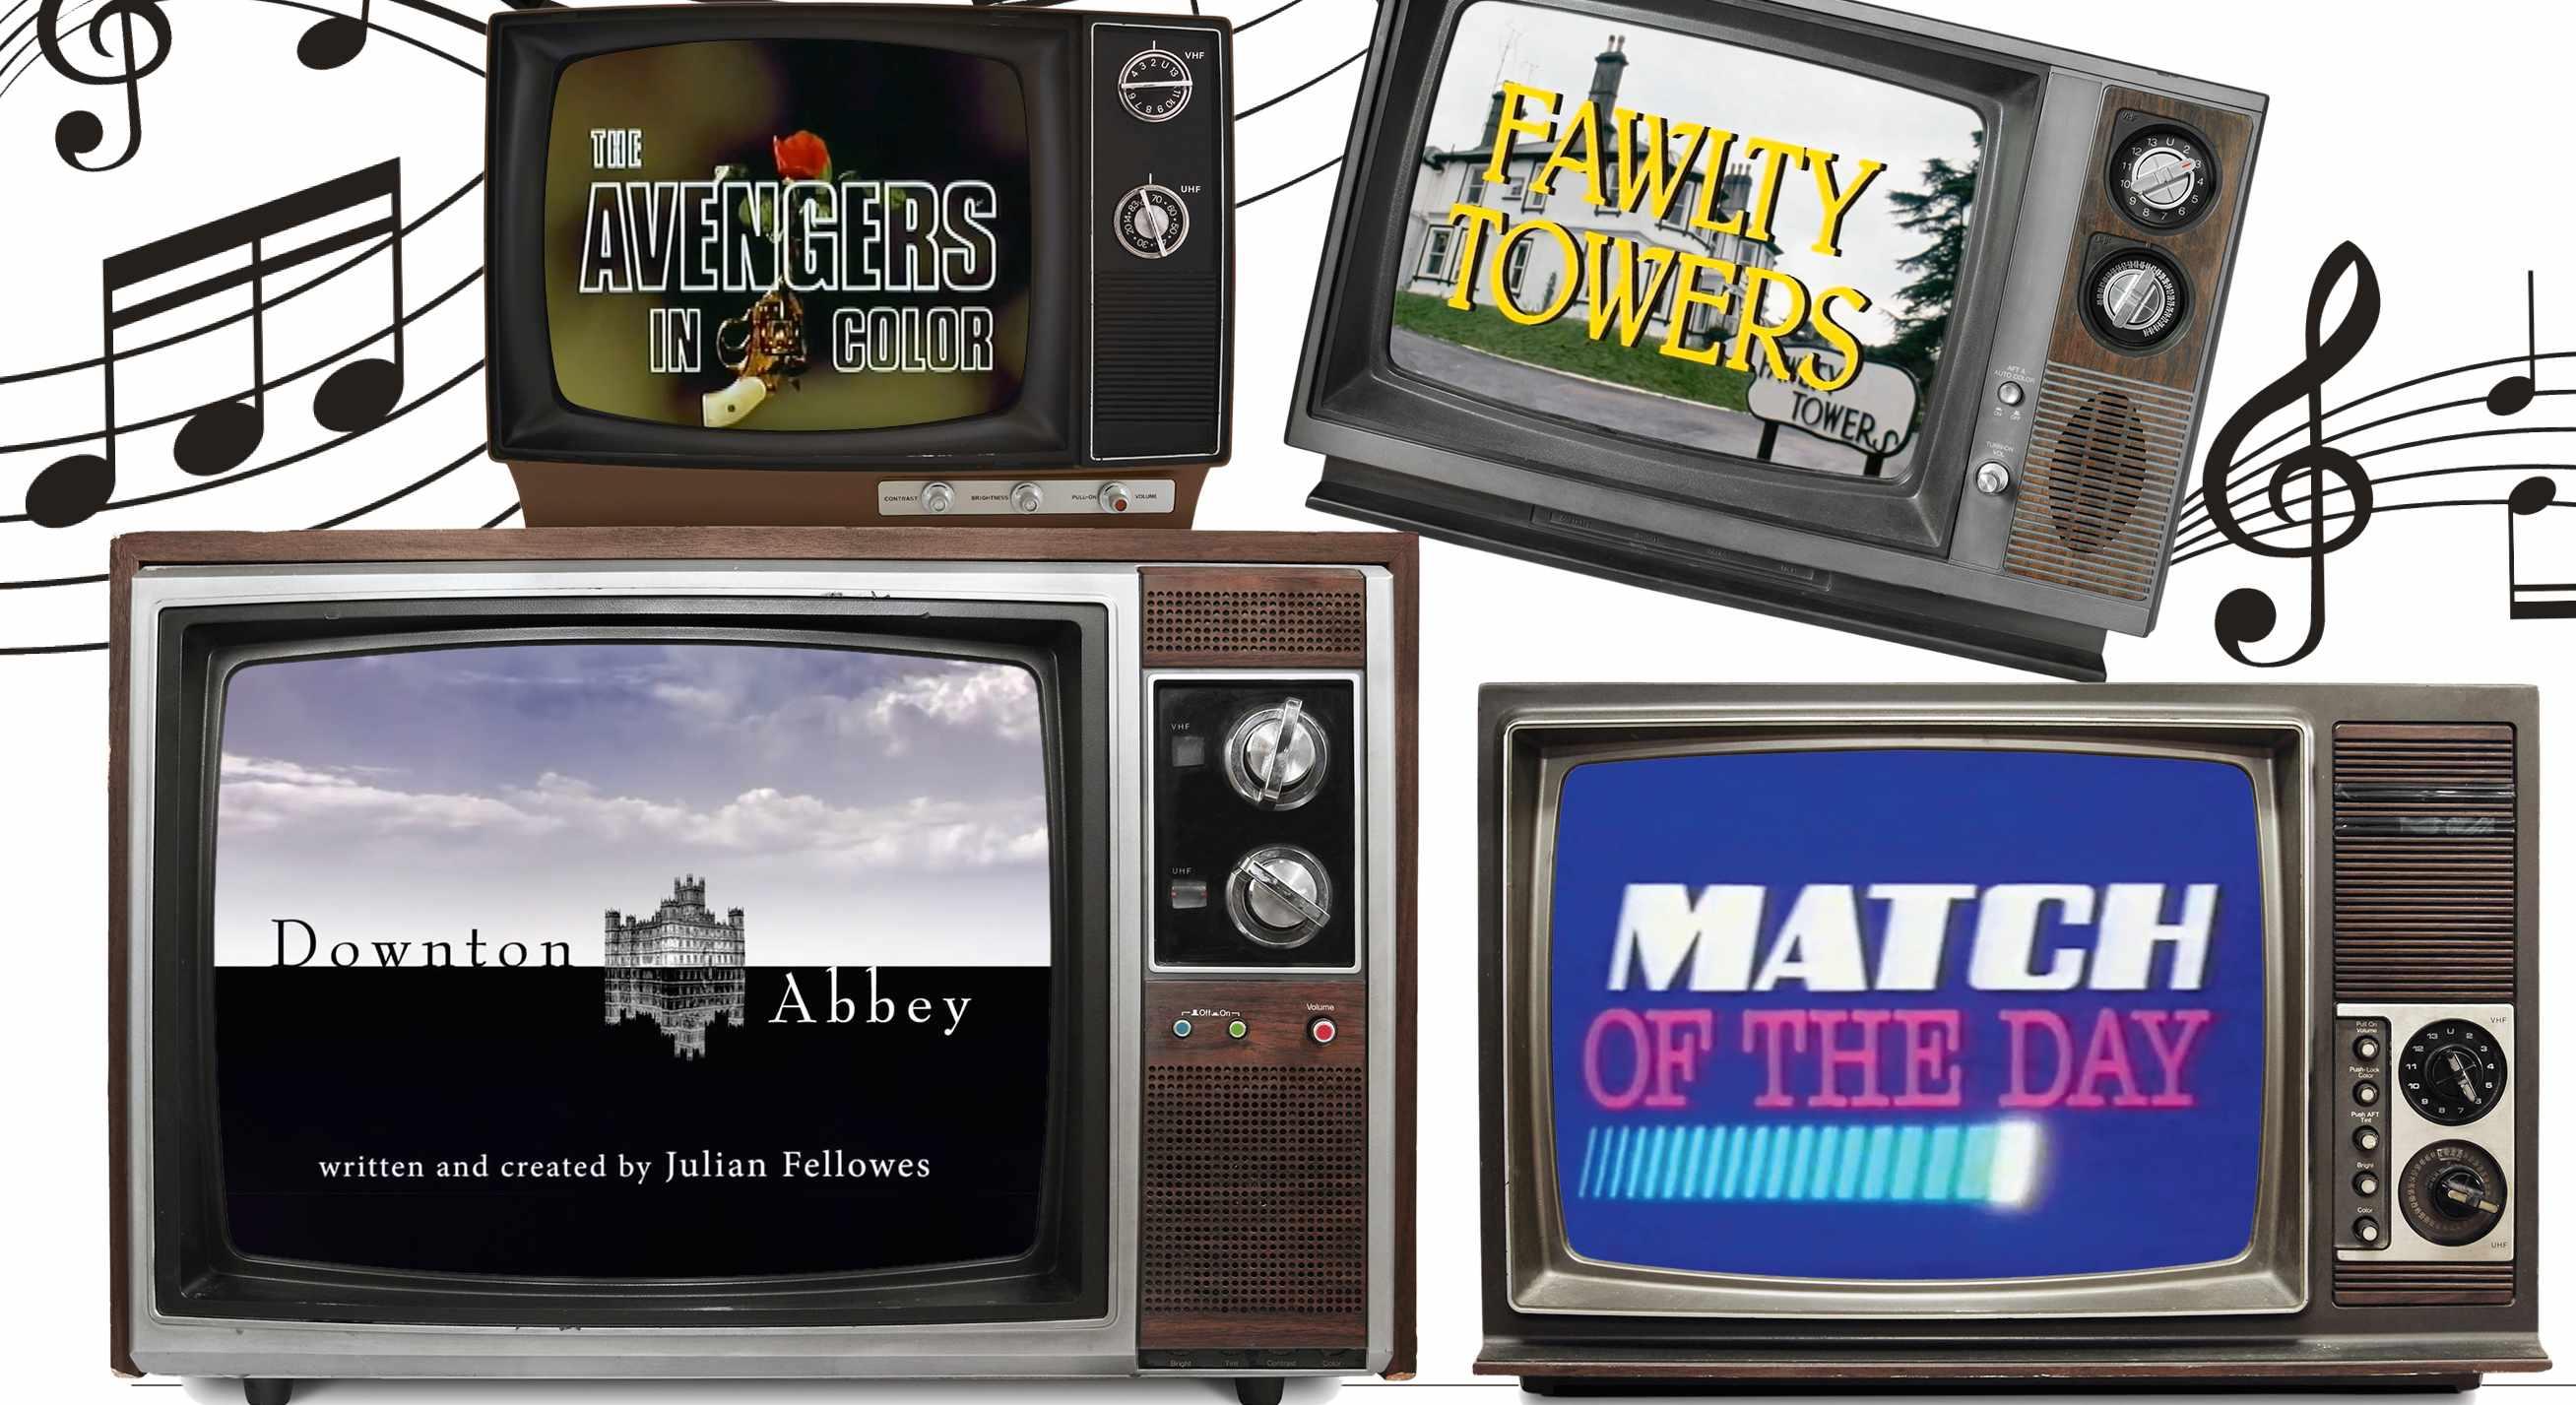 Radio Times TV theme vote